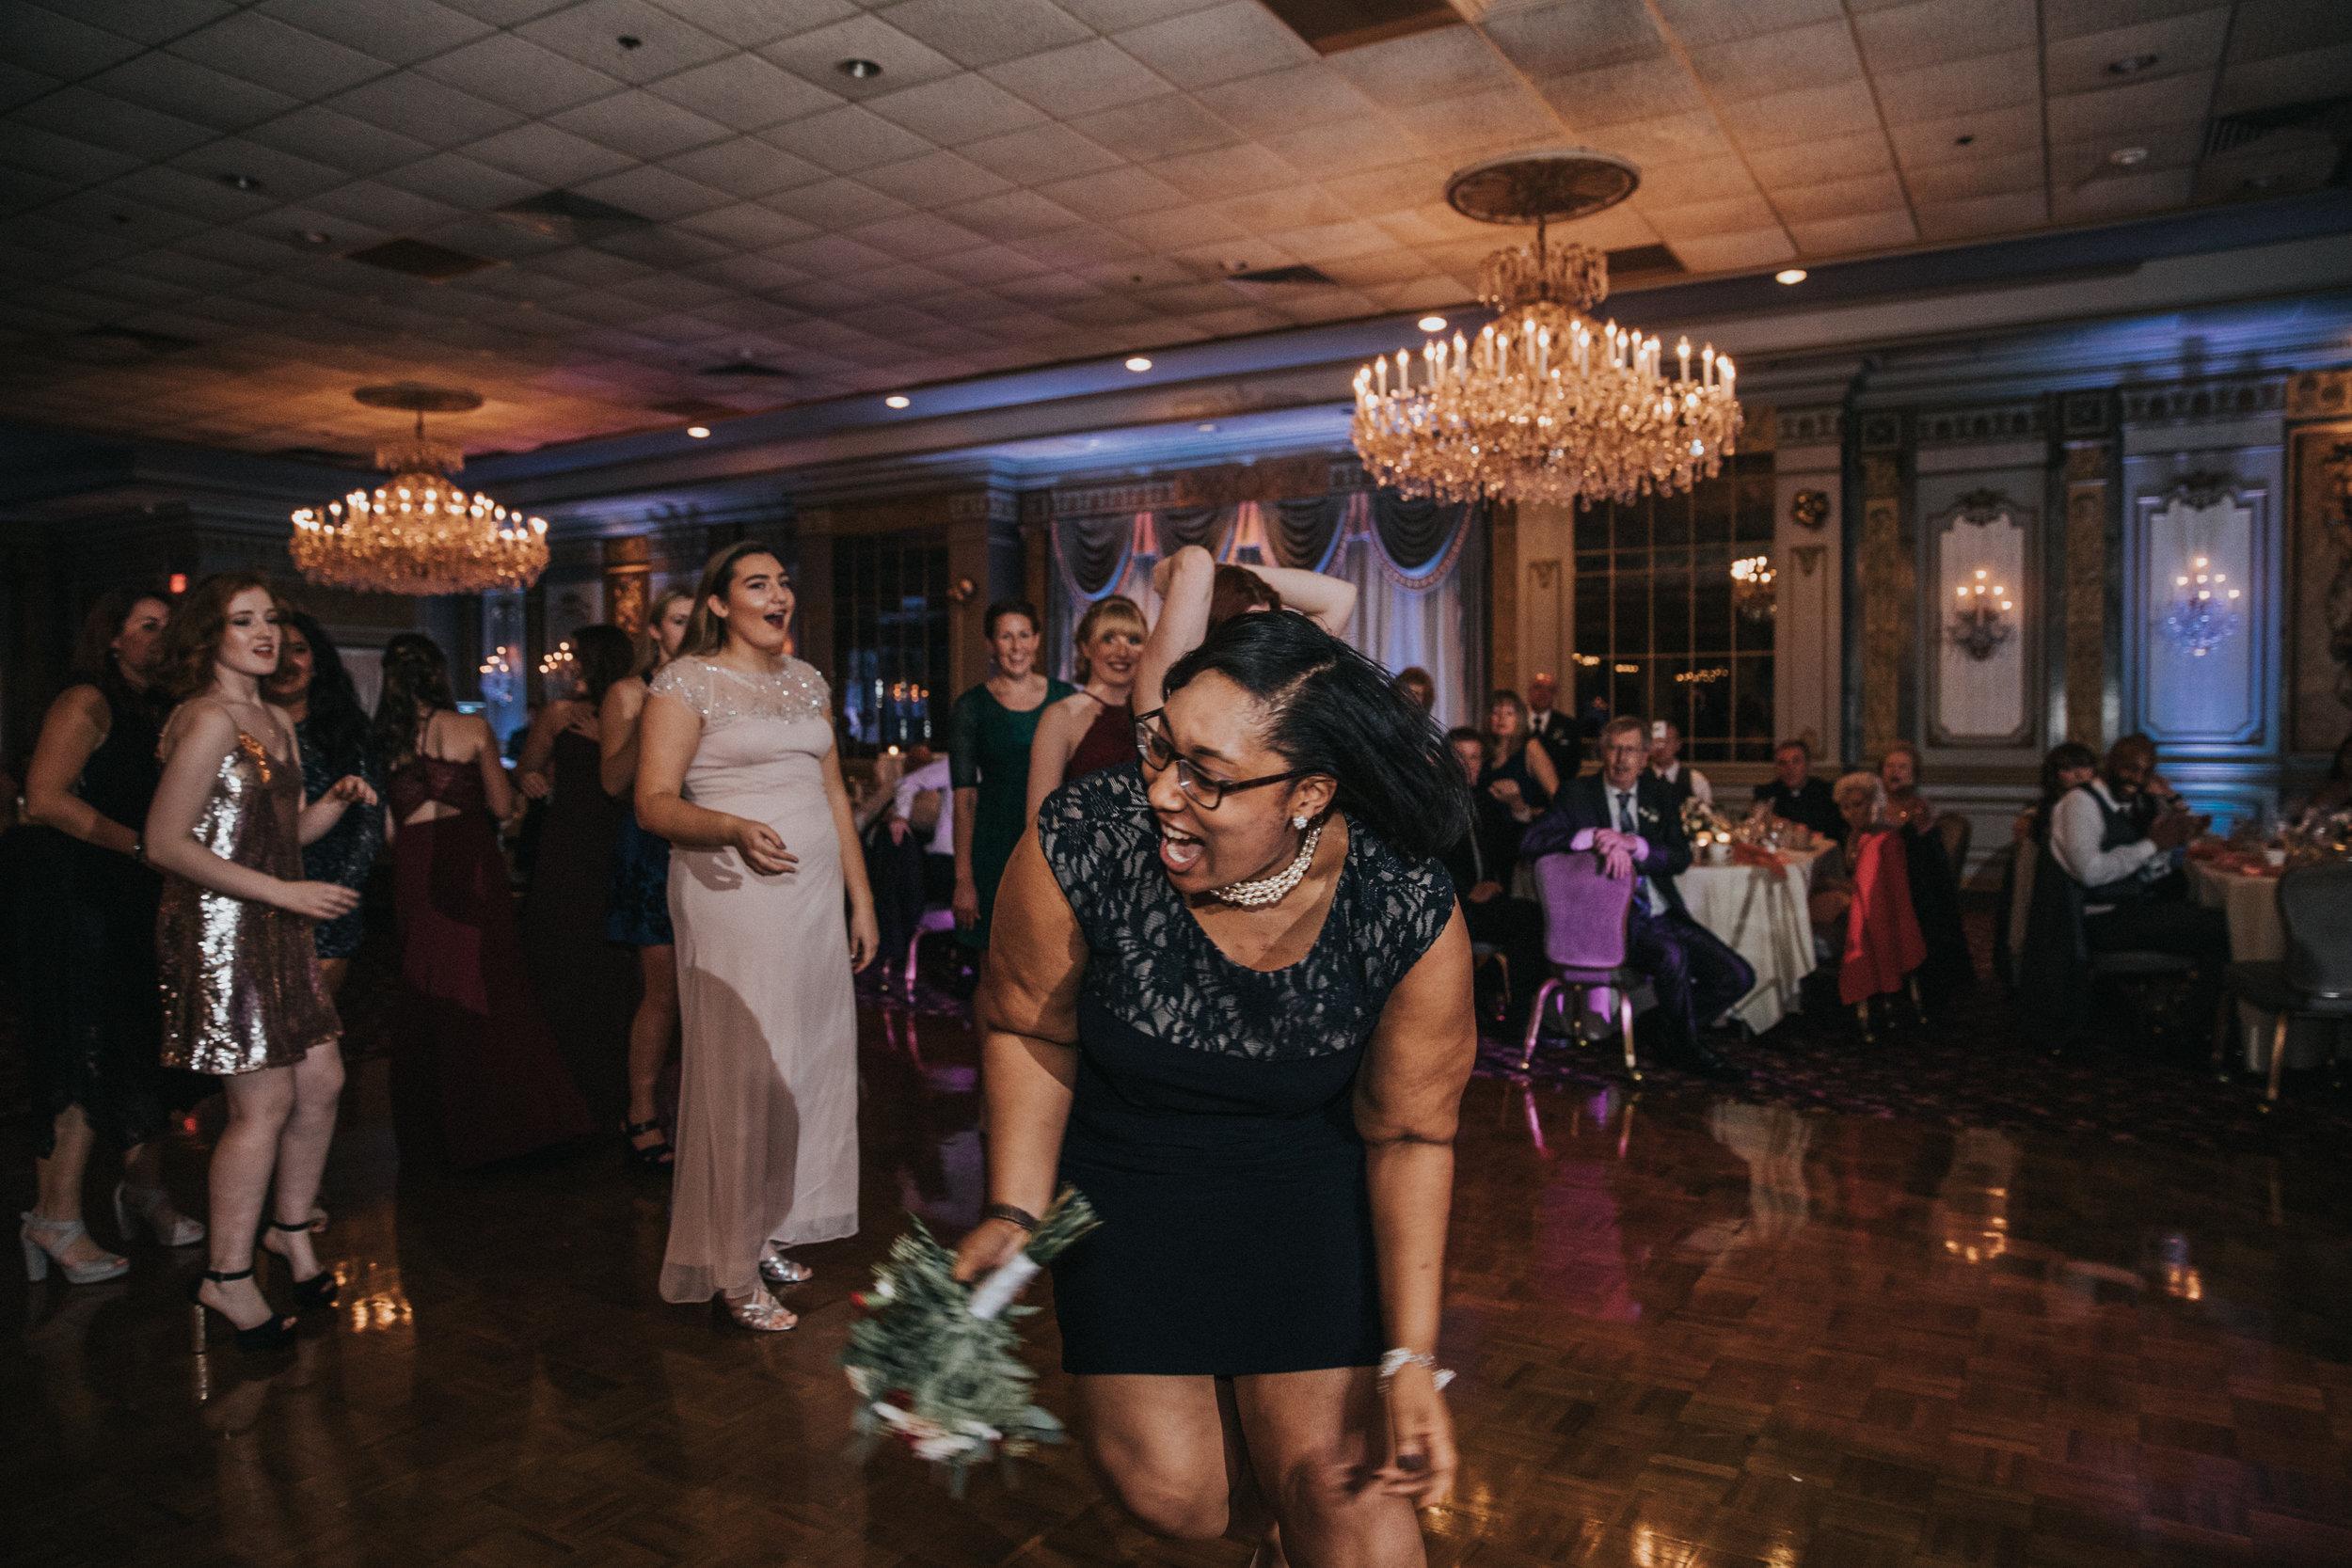 New-Jersey-Wedding-Photography-Fishers-Tudor-House-JennaLynnPhotography-Reception-Kathleen&Eddie-186.jpg